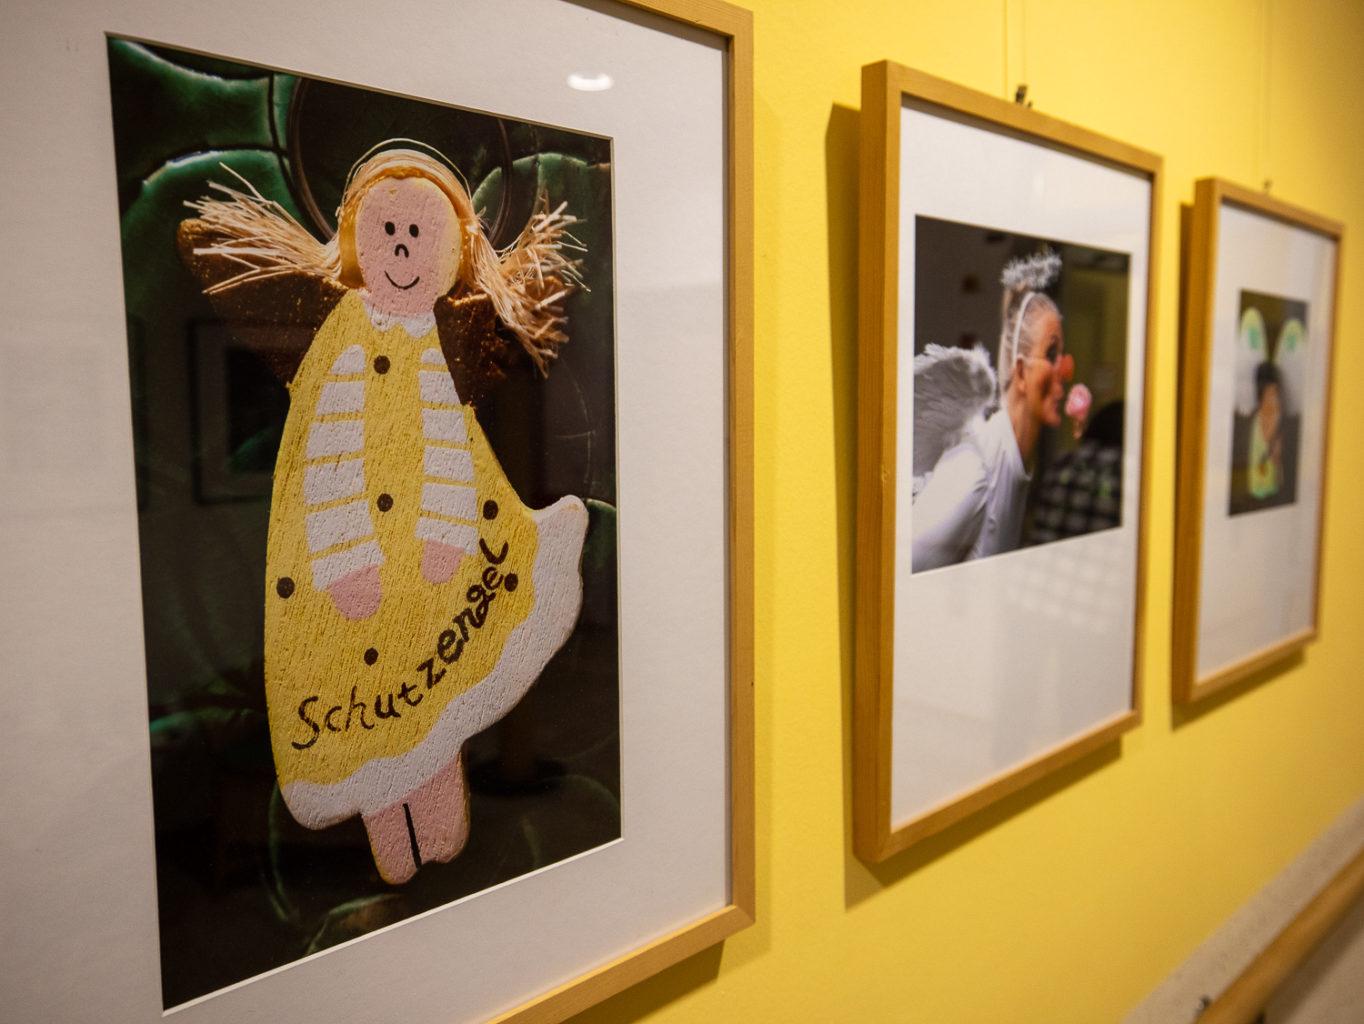 Engel-Ausstellung im Achatiushaus in Wolbeck. Foto: A. Hasenkamp.